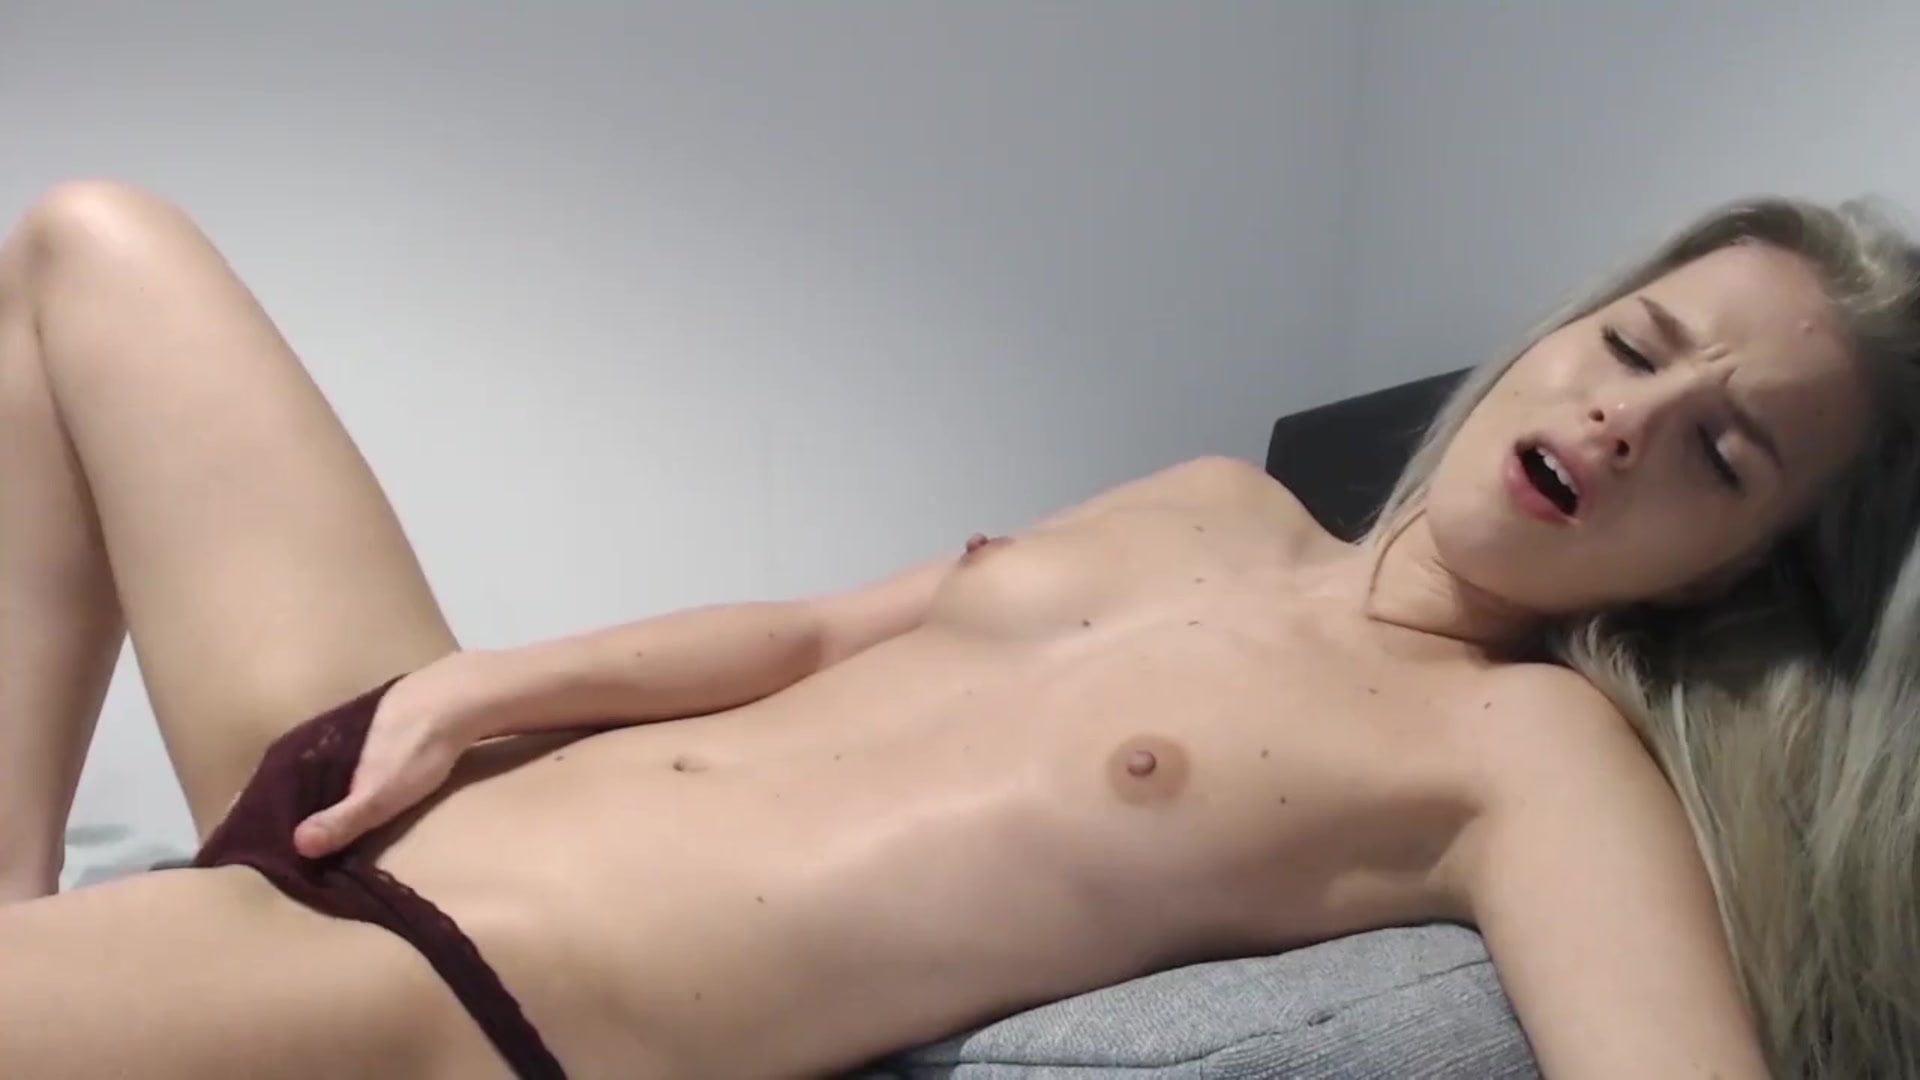 Home Alone - Cute Teen Masturbating Hard, Porn B8 Xhamster Fr-1257